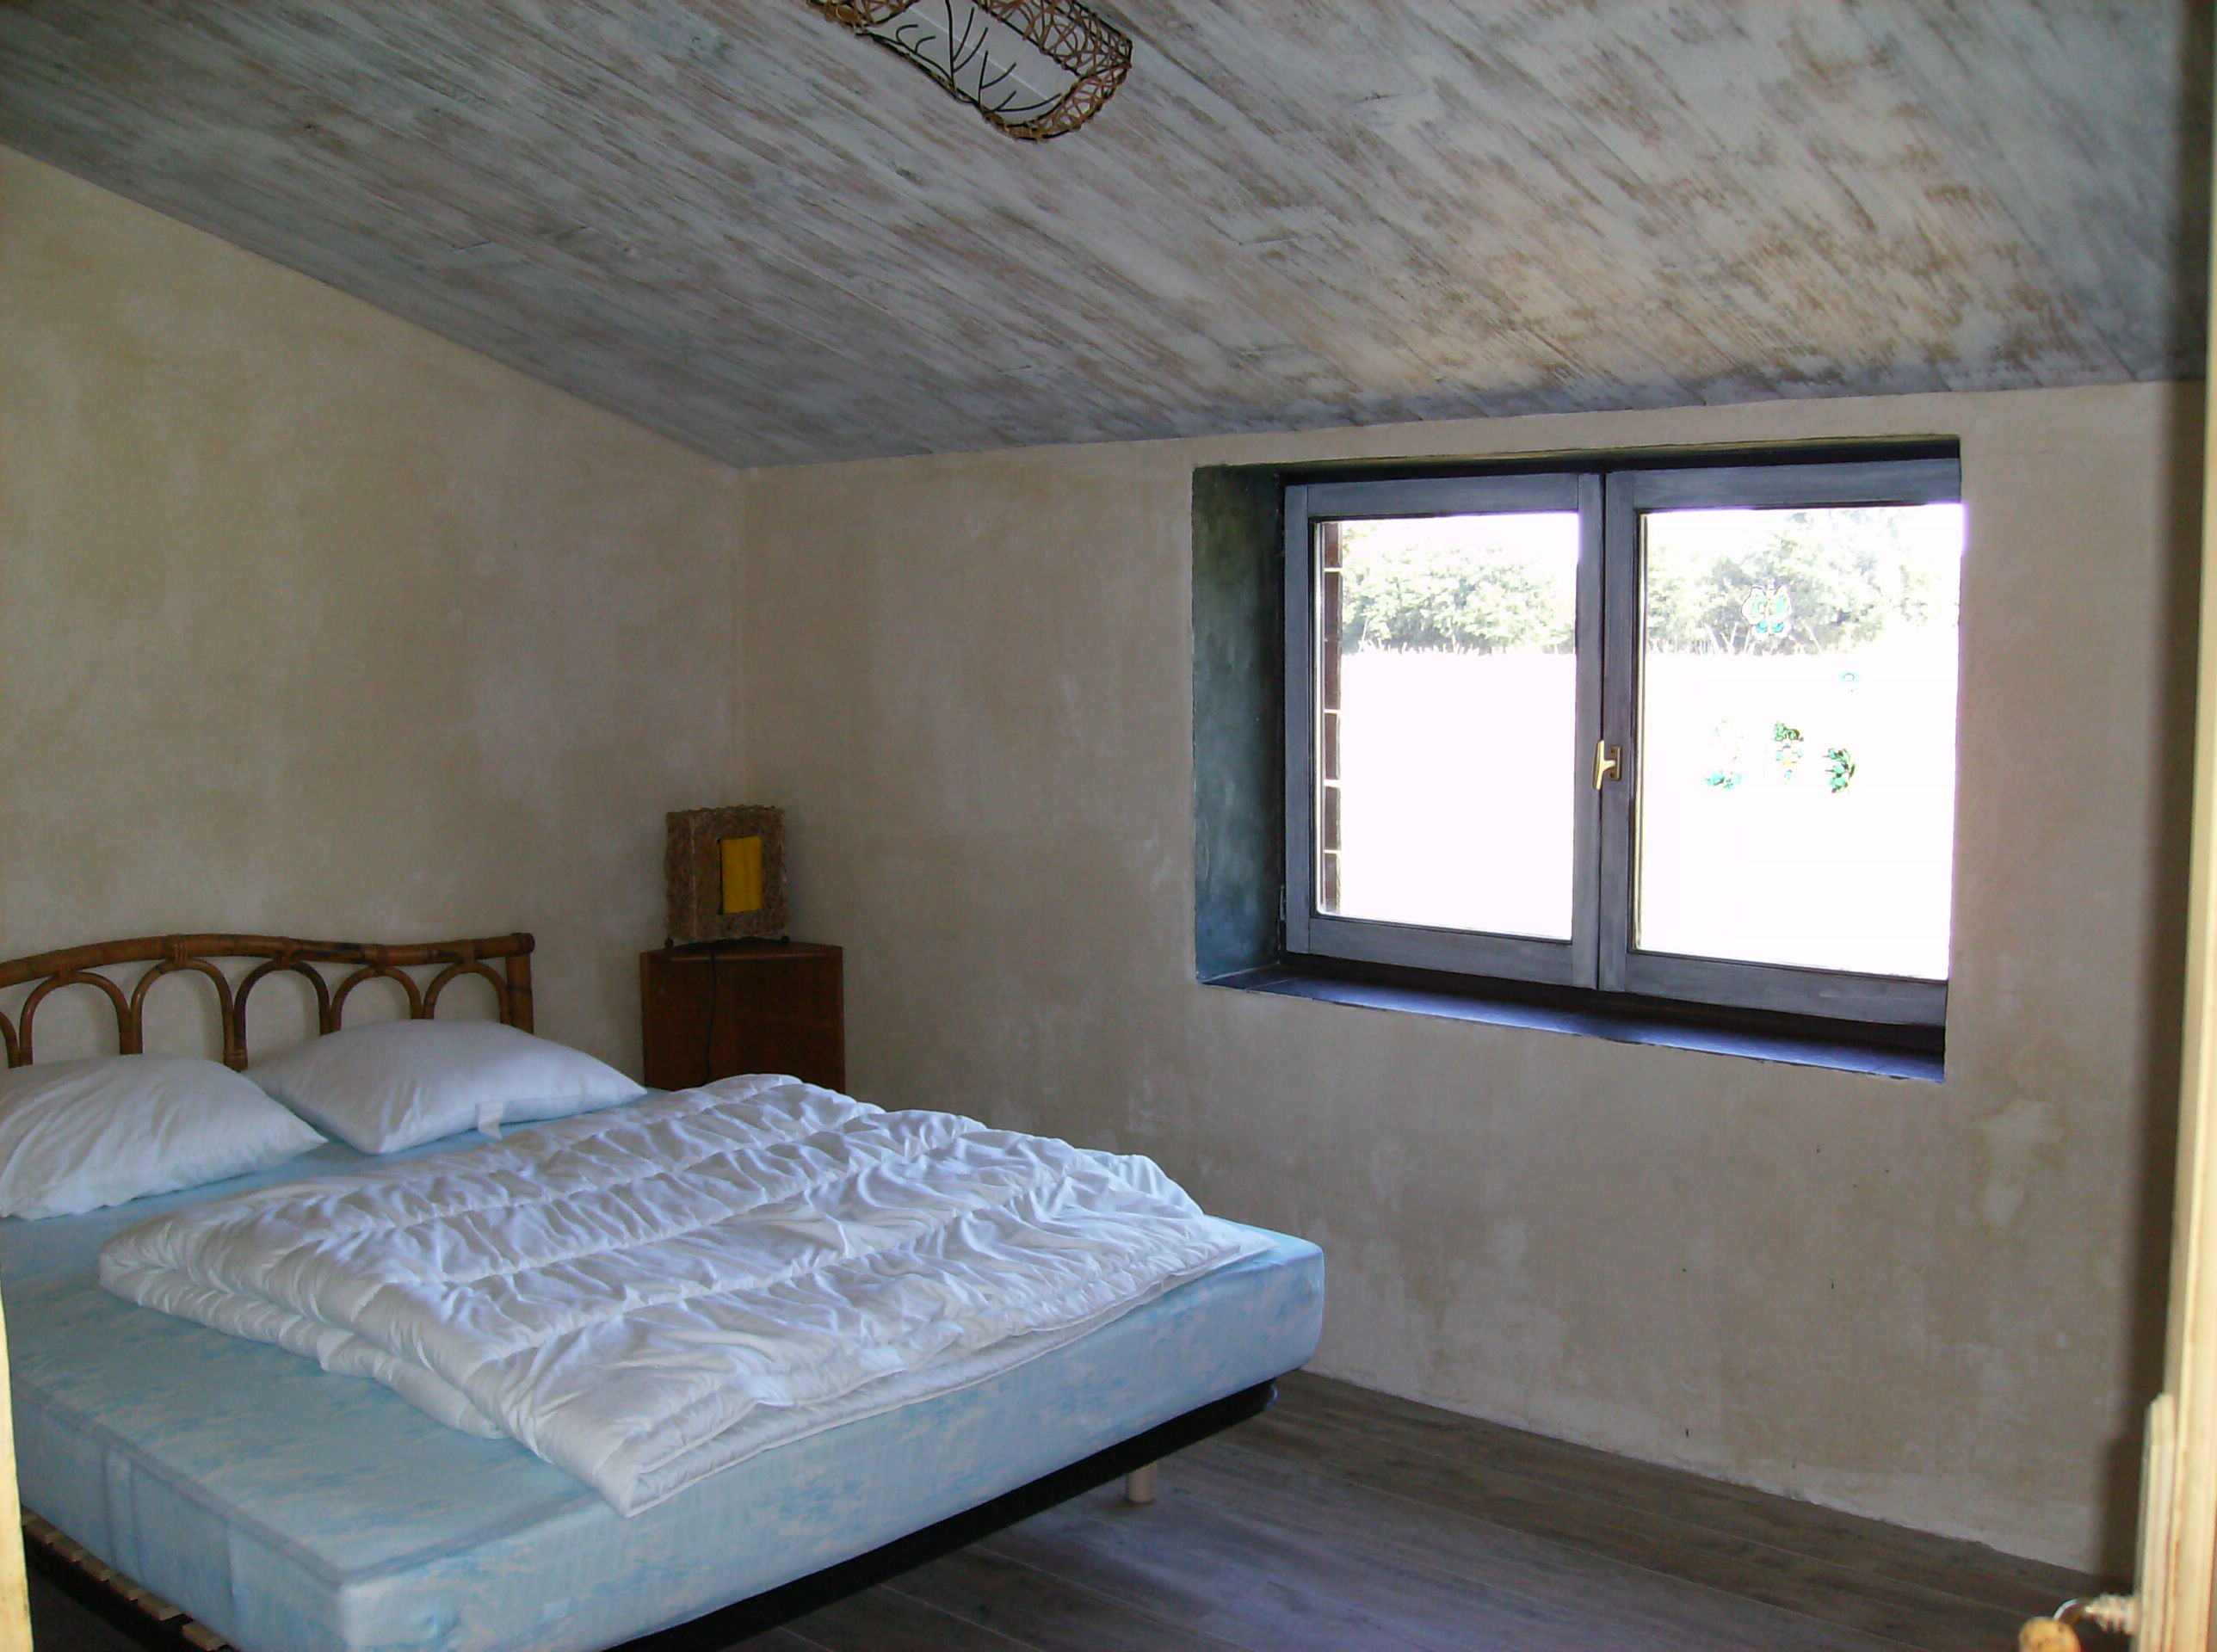 Location tudiant chambre chez l 39 habitant - Trouver une chambre chez l habitant ...